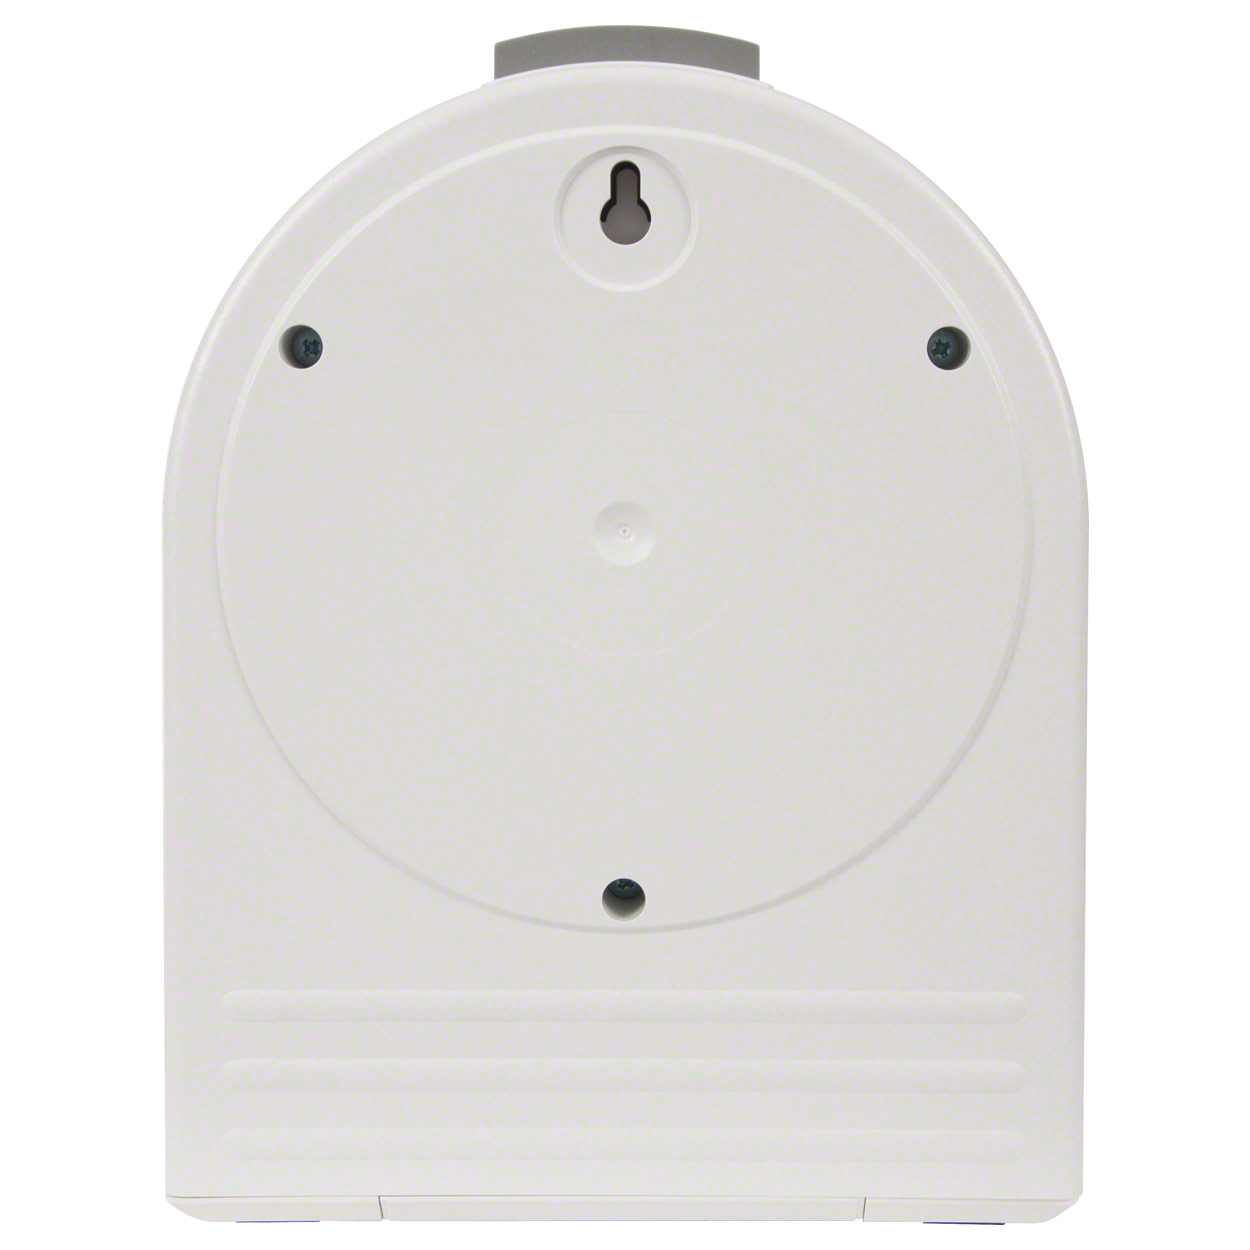 Candy Hoover 46001949 ORIGINAL Sto/ßd/ämpfer Ferbein Federung Schwingungsd/ämpfer D/ämpfer 100N Waschmaschine